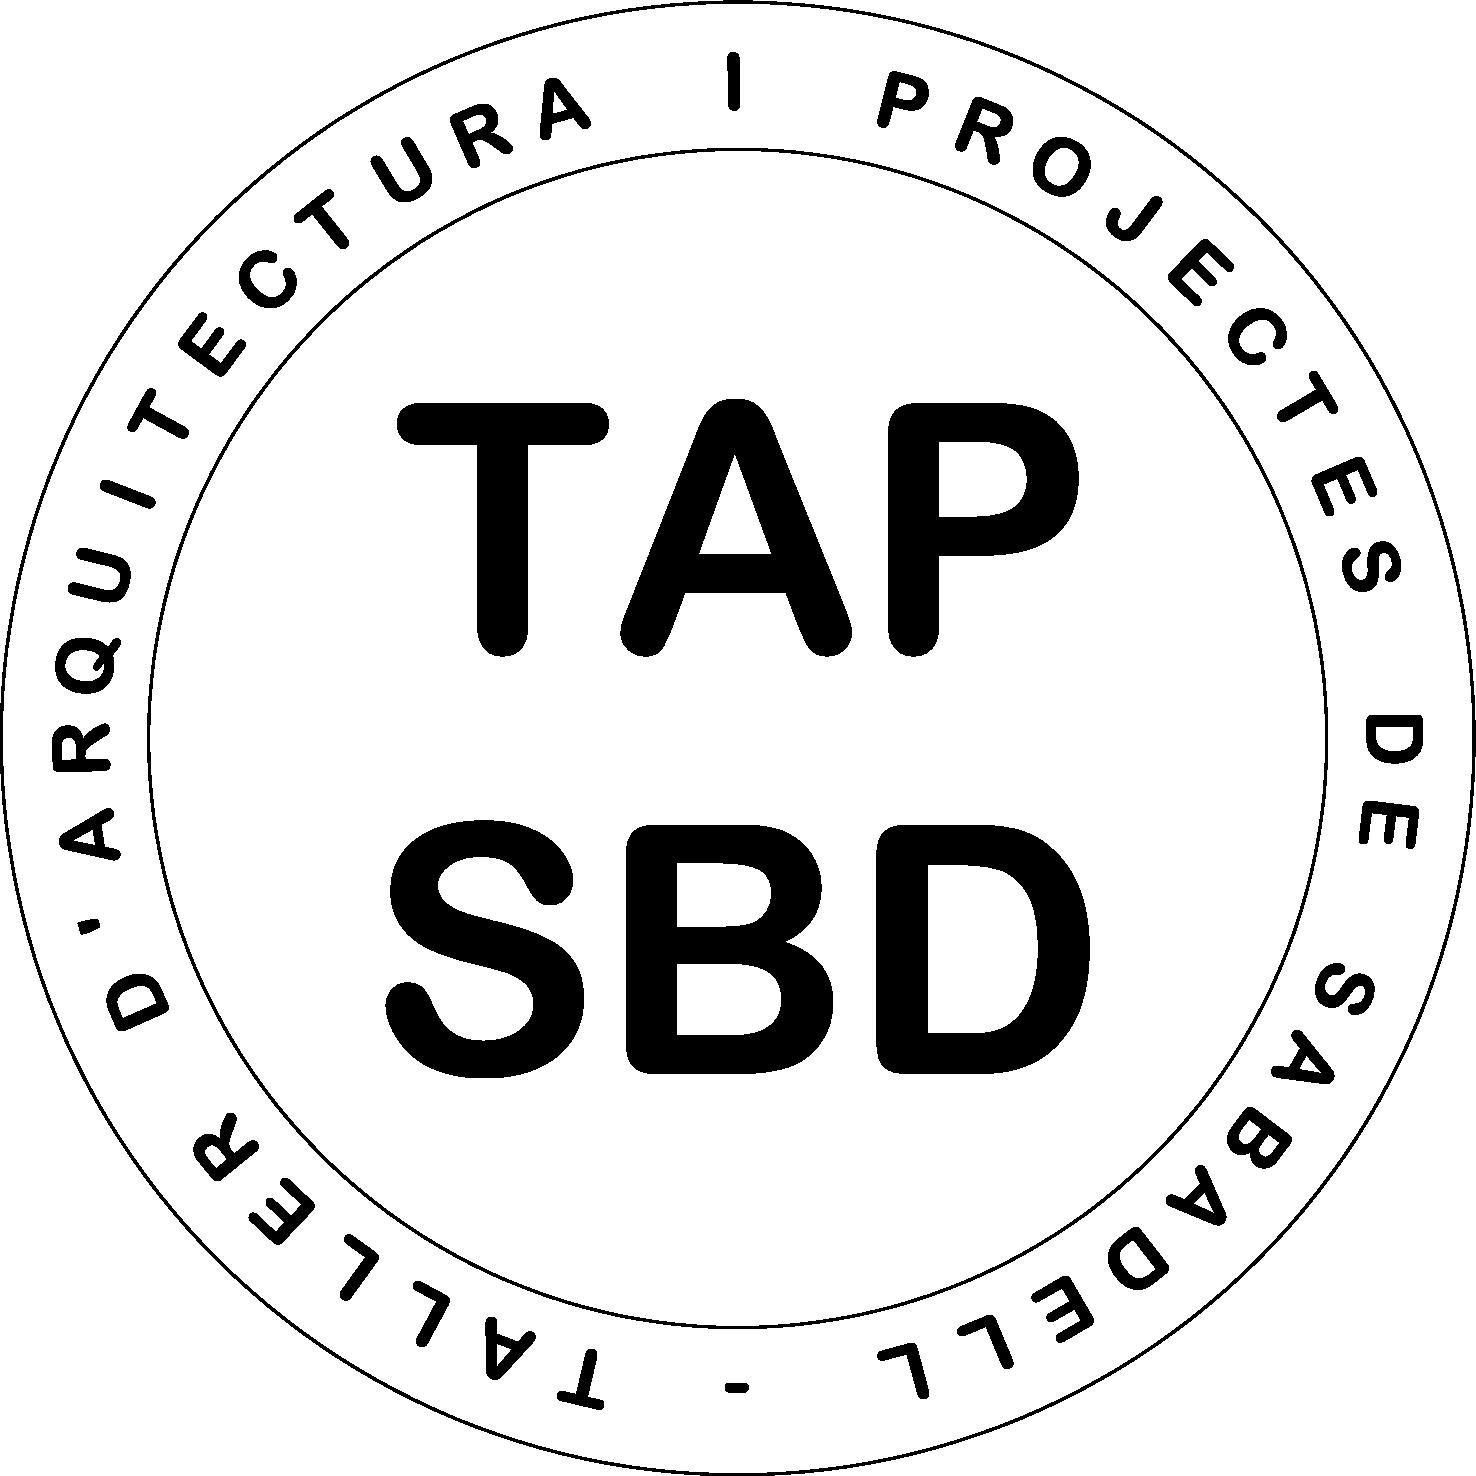 Tapsbd.com